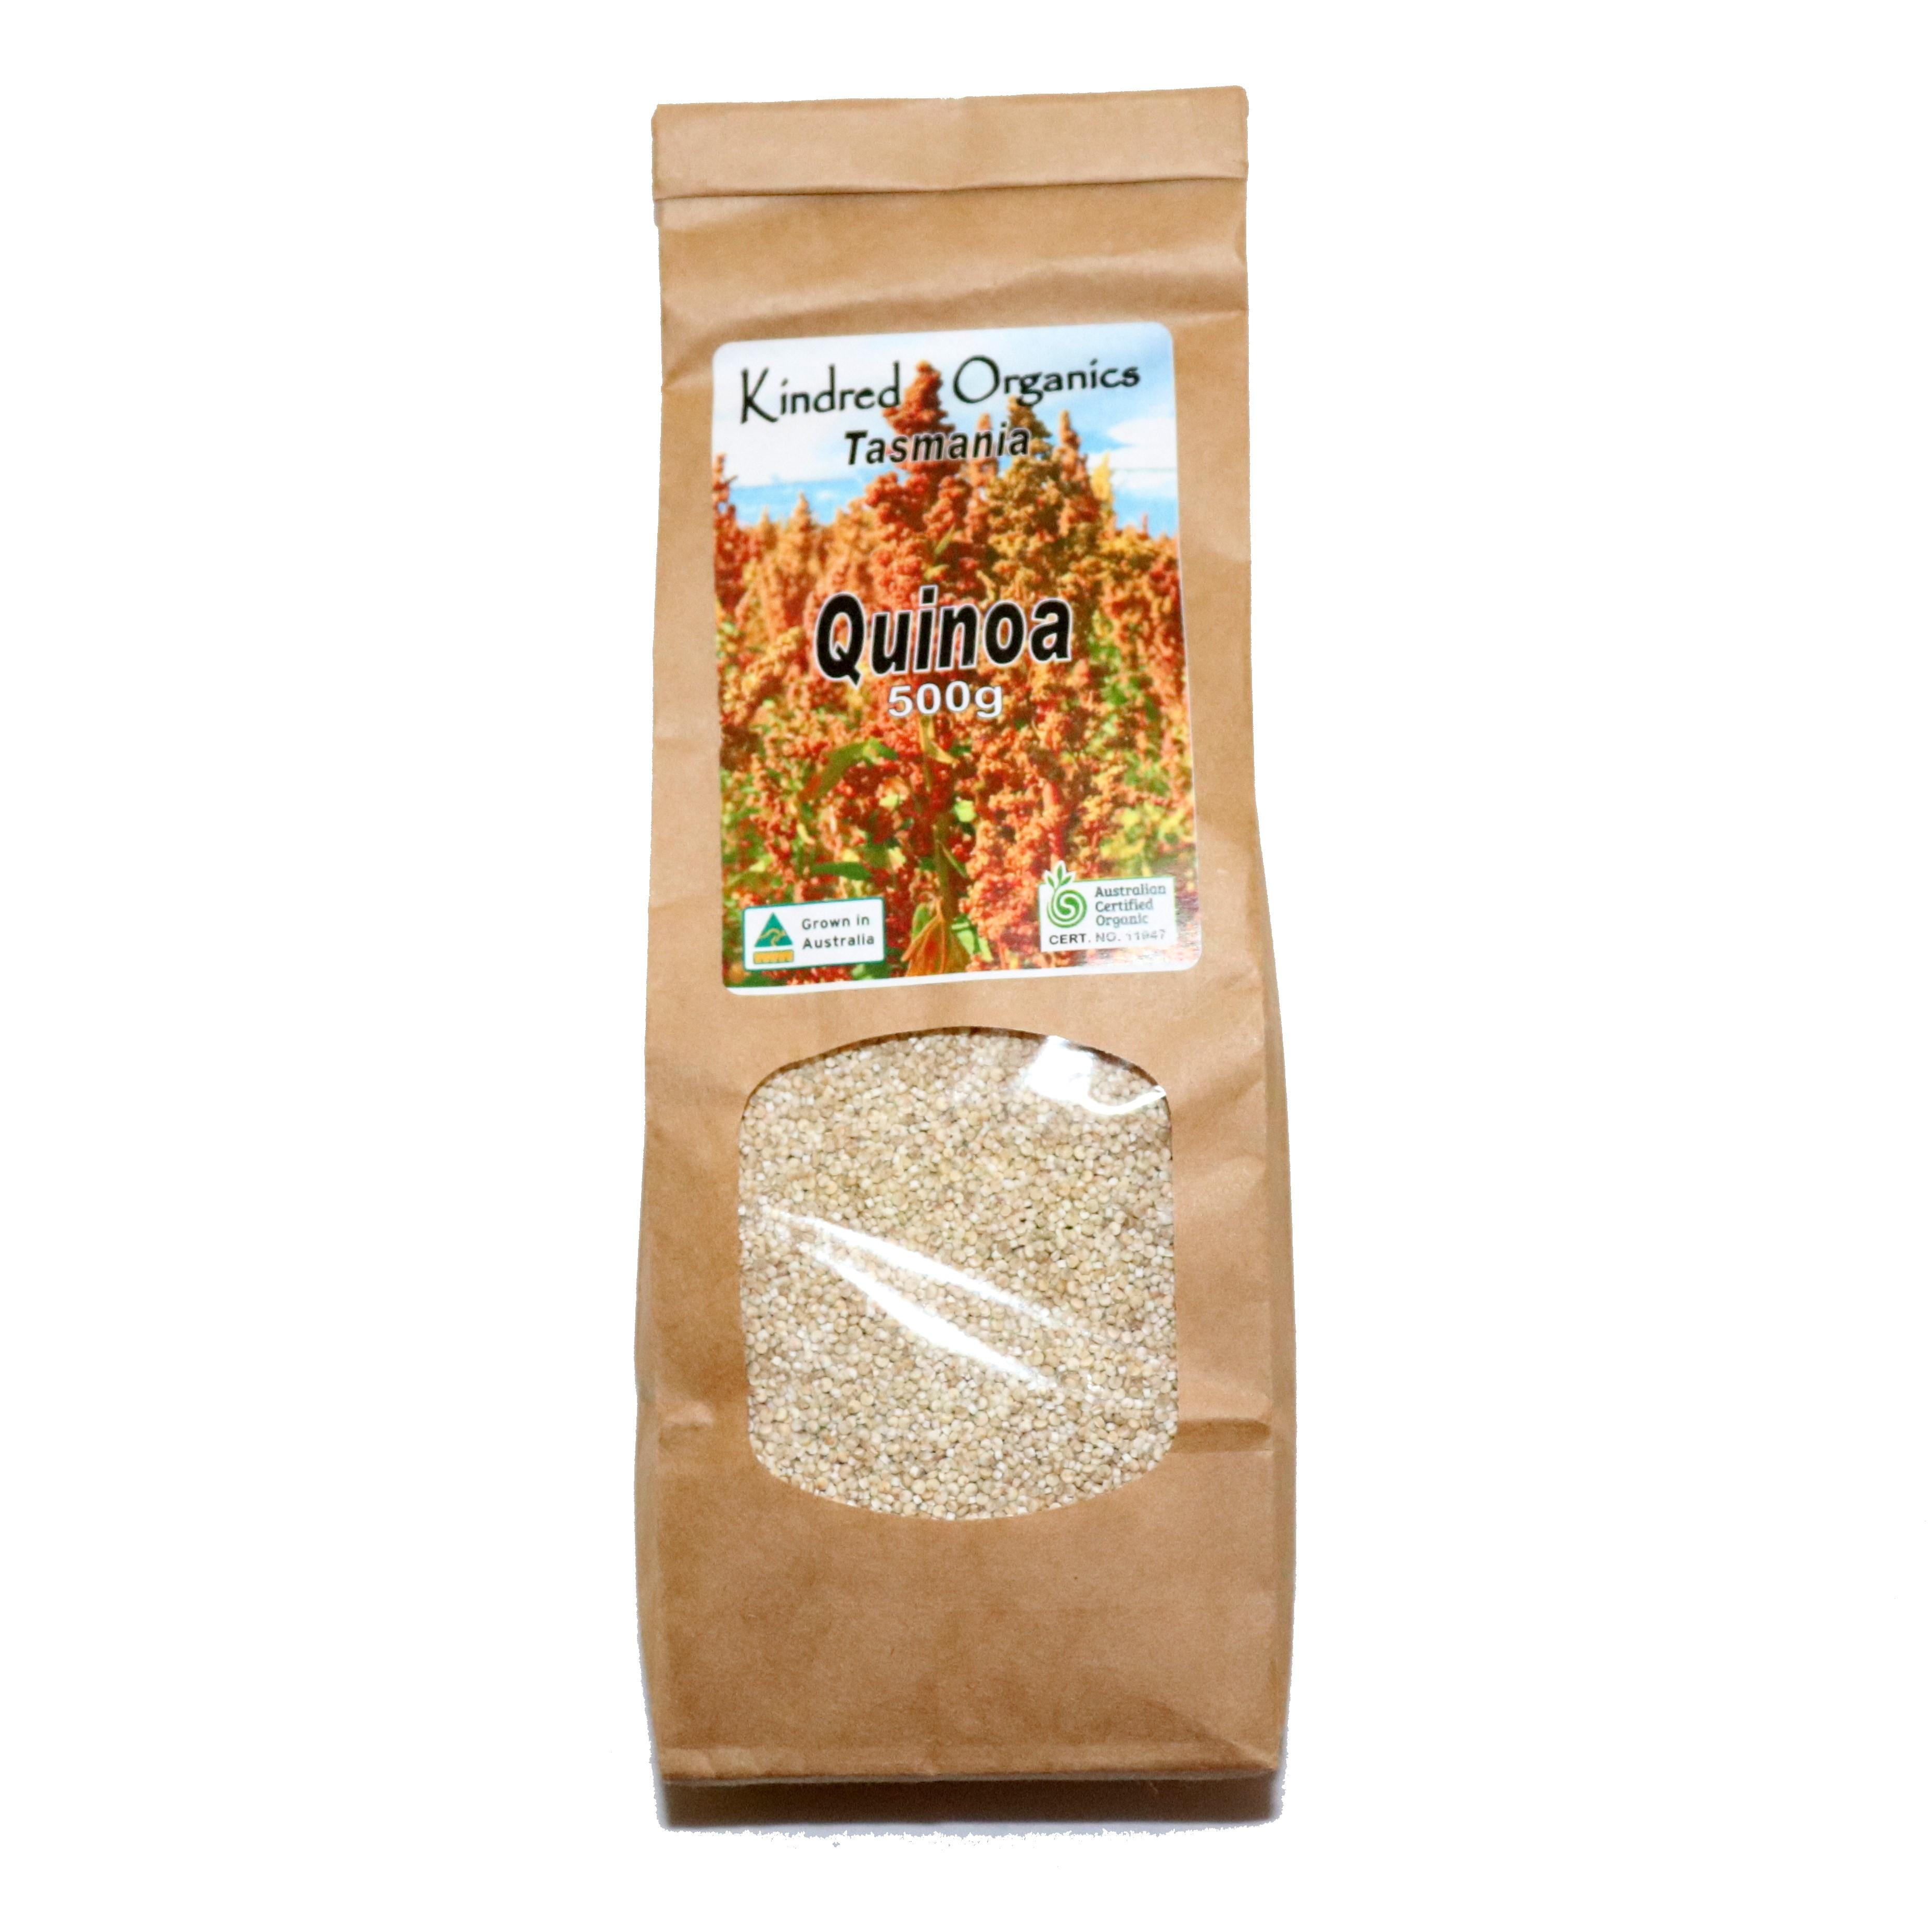 Kindred Organic Quinoa 500g